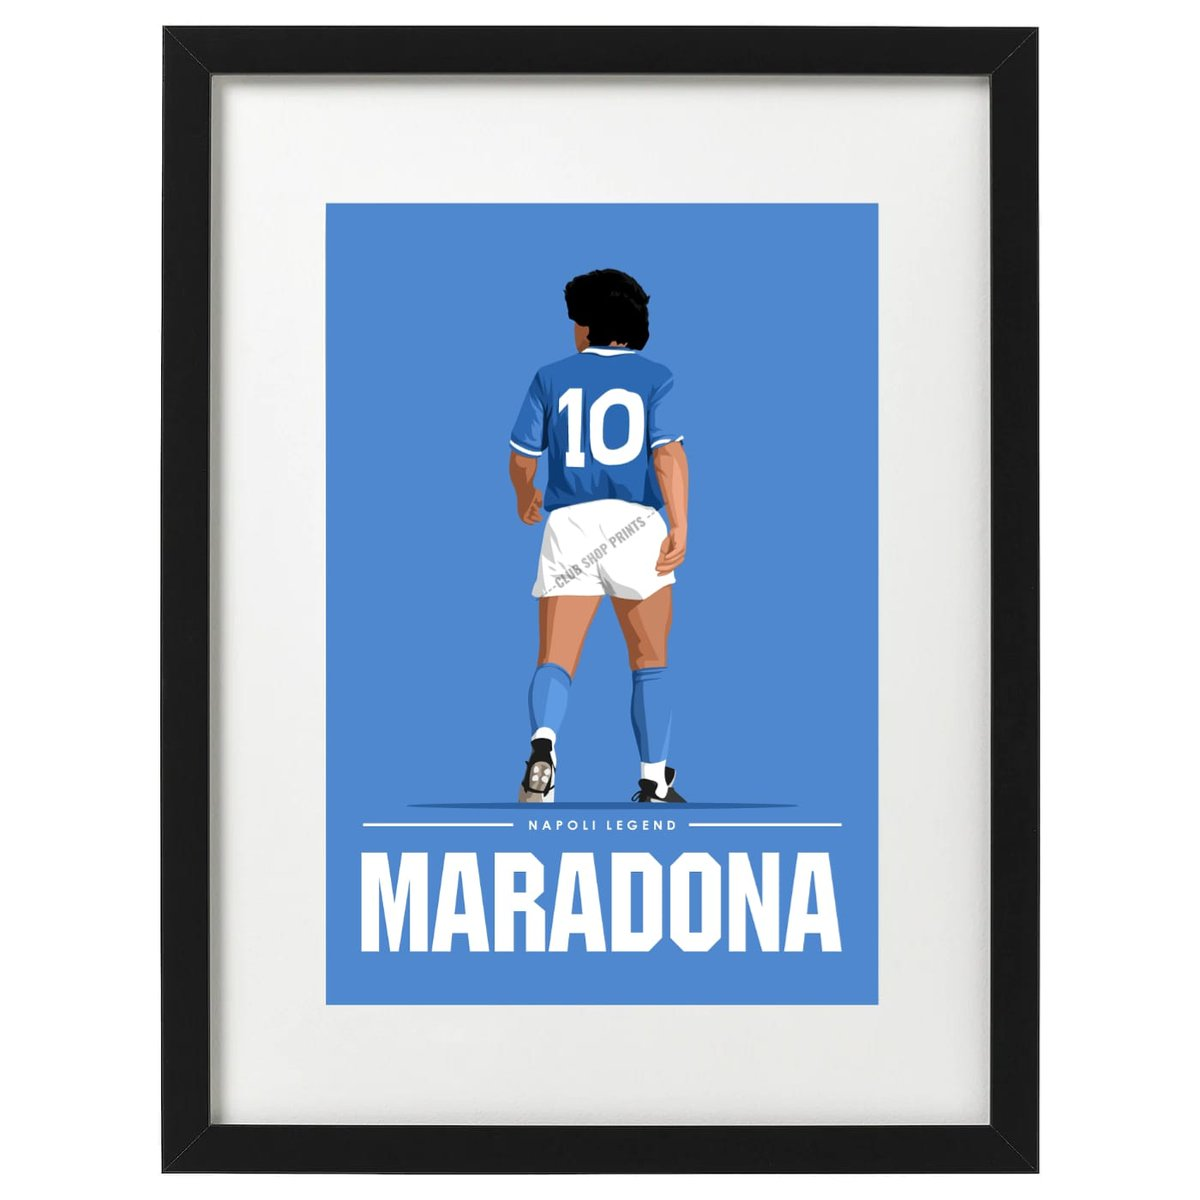 Diego Maradona art prints available now. Free UK delivery. Link in bio  #footballart #etsy #etsyshop #Maradona #Napoli #worldcupfinal #worldcuprewind #diegomaradona #ForzaNapoliSempre<br>http://pic.twitter.com/QBxQwyjbbB